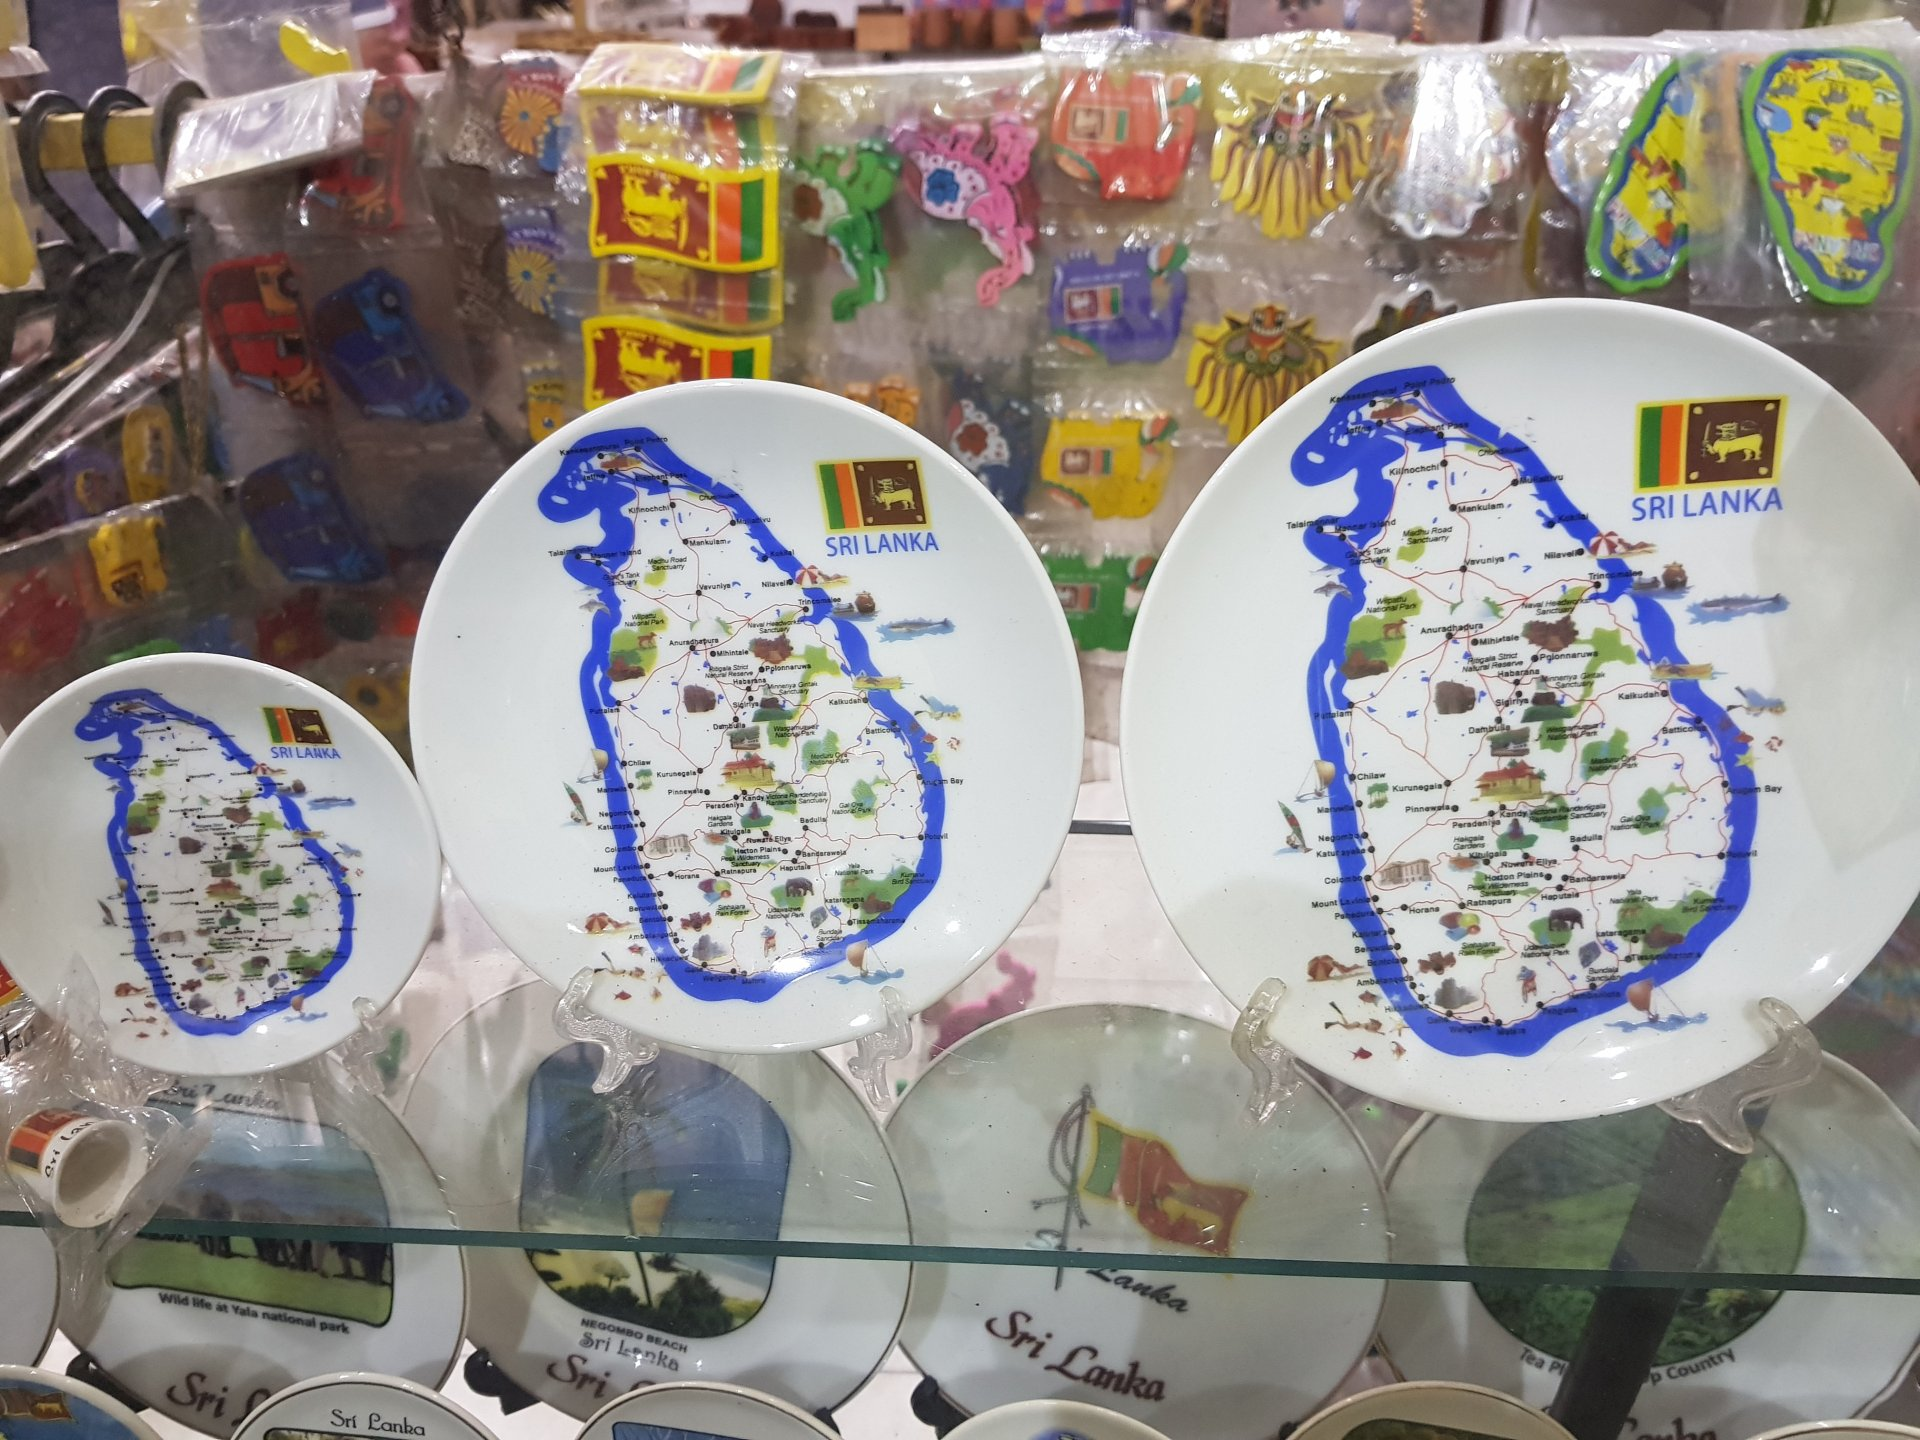 сувенирные тарелки. Шри-Ланка